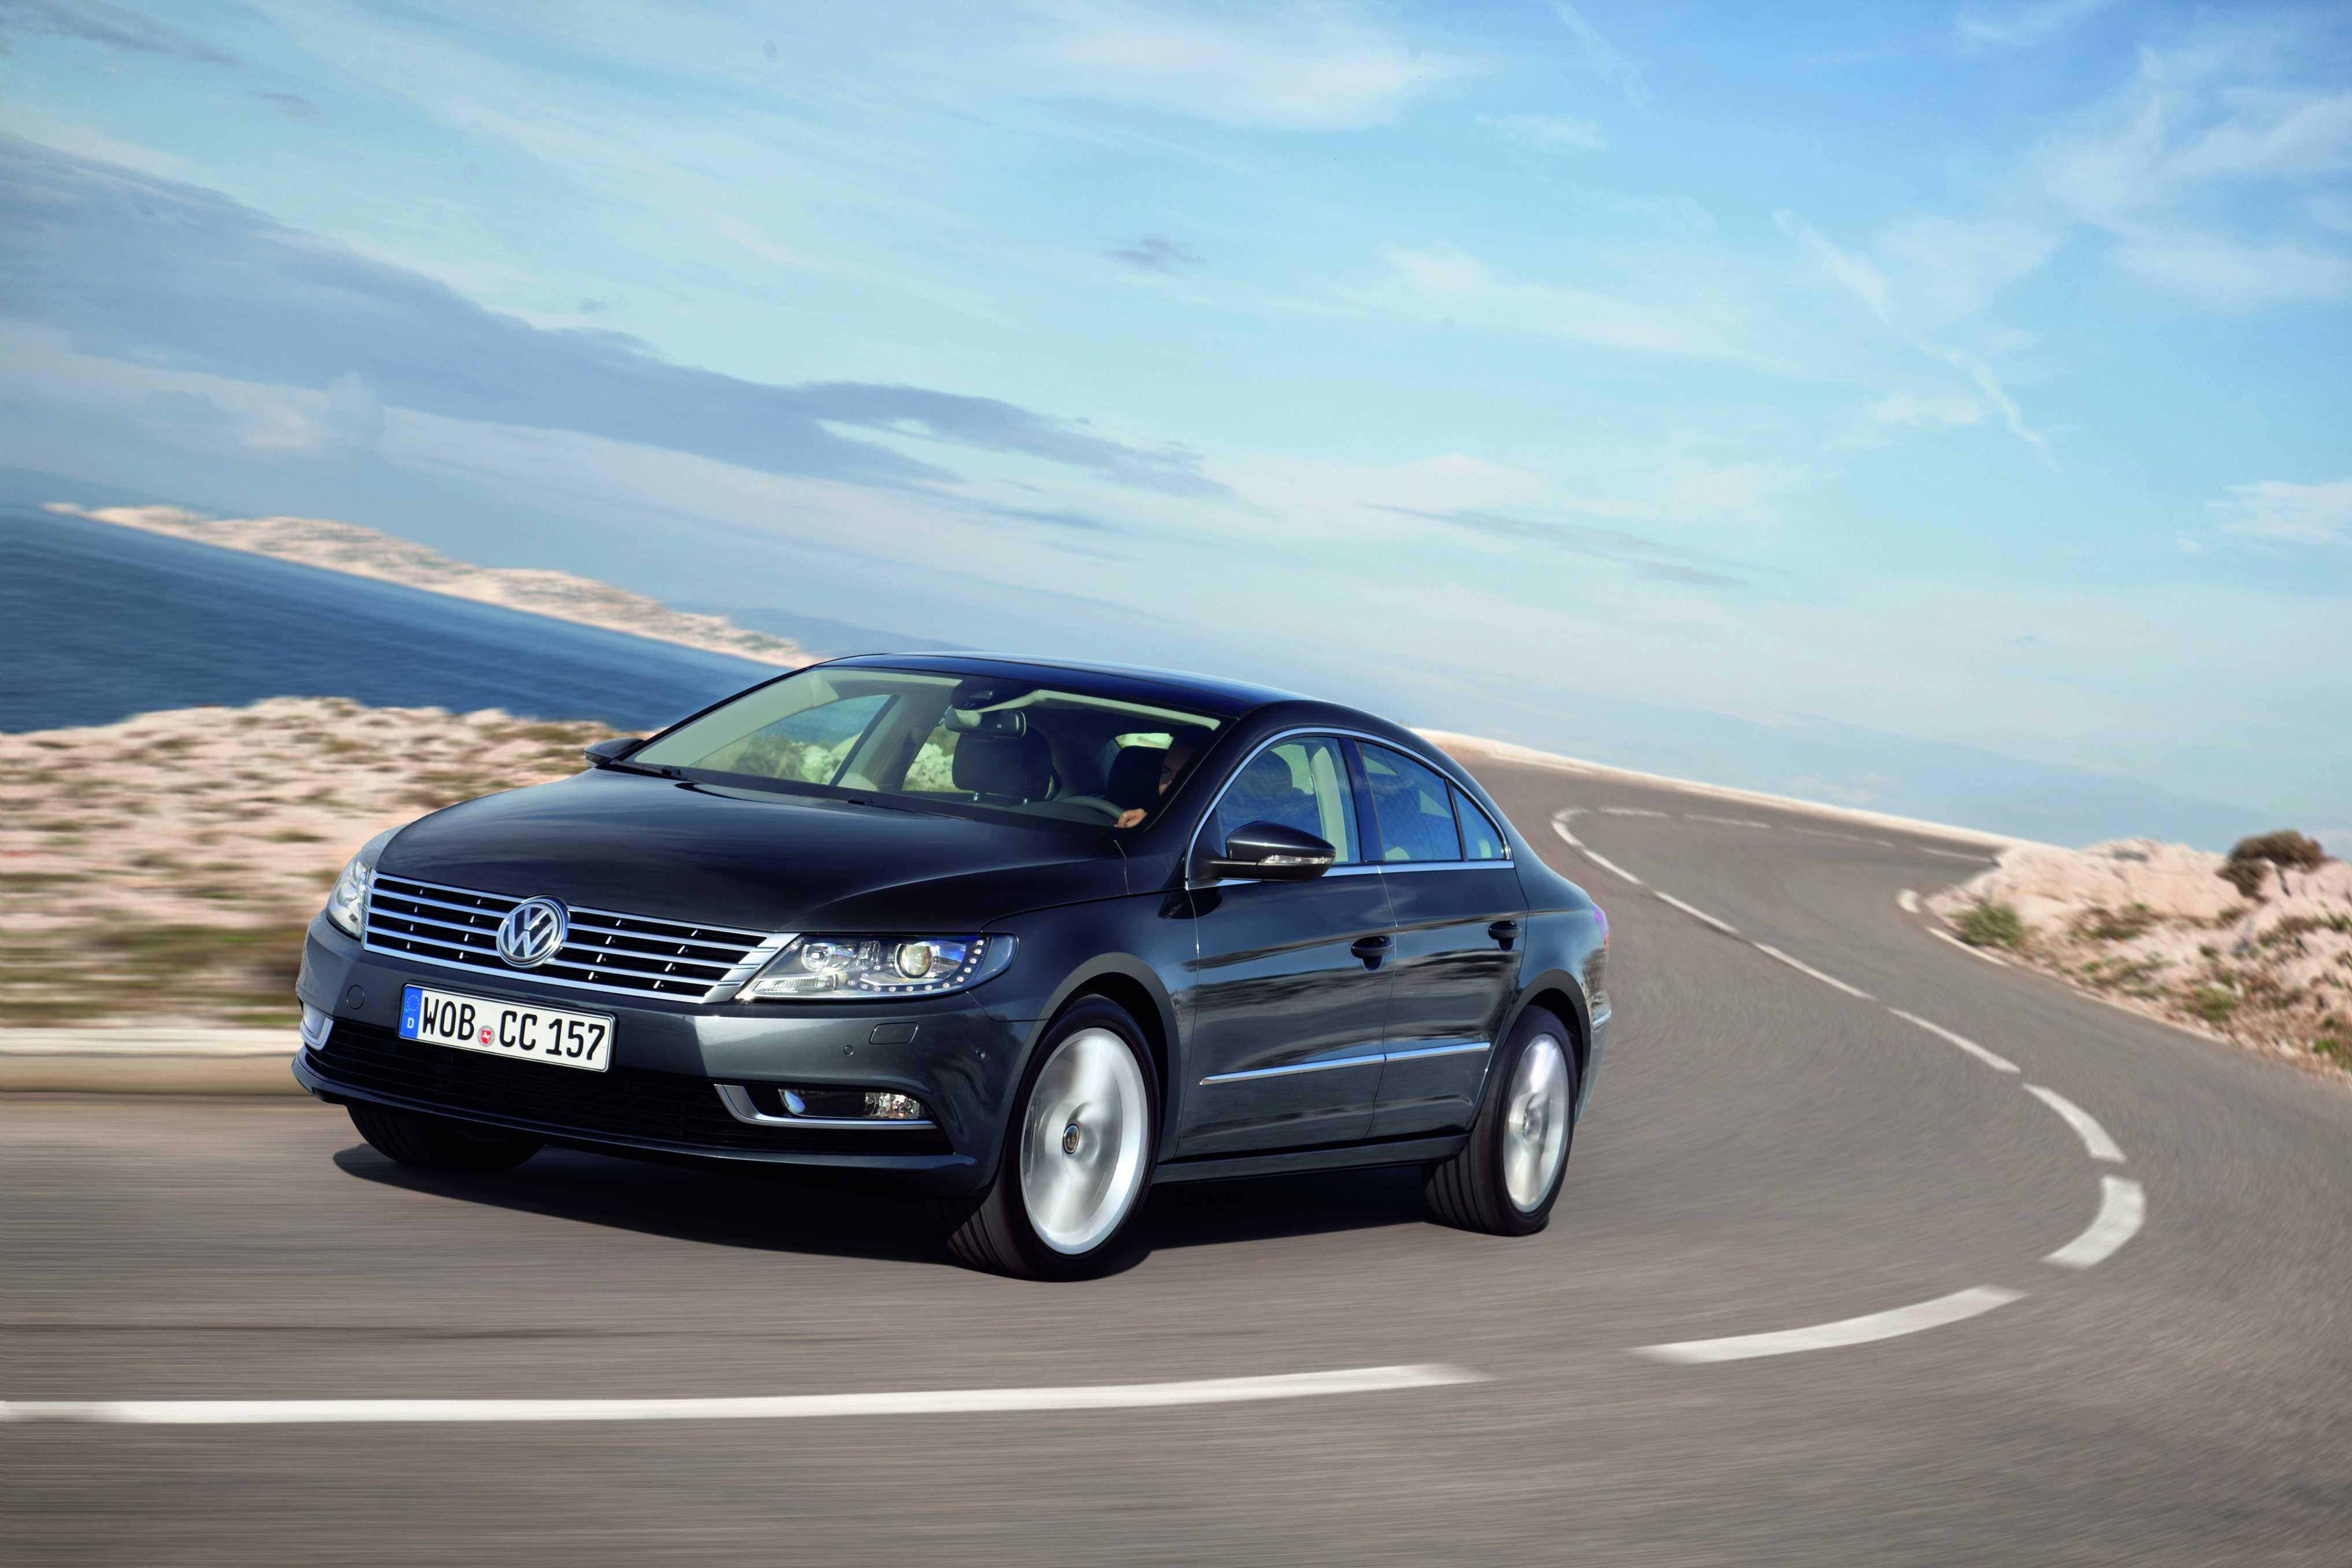 r car edit volkswagen sales automotive volkswagon tdi uk sold cc stocklist passat vw for gt sale